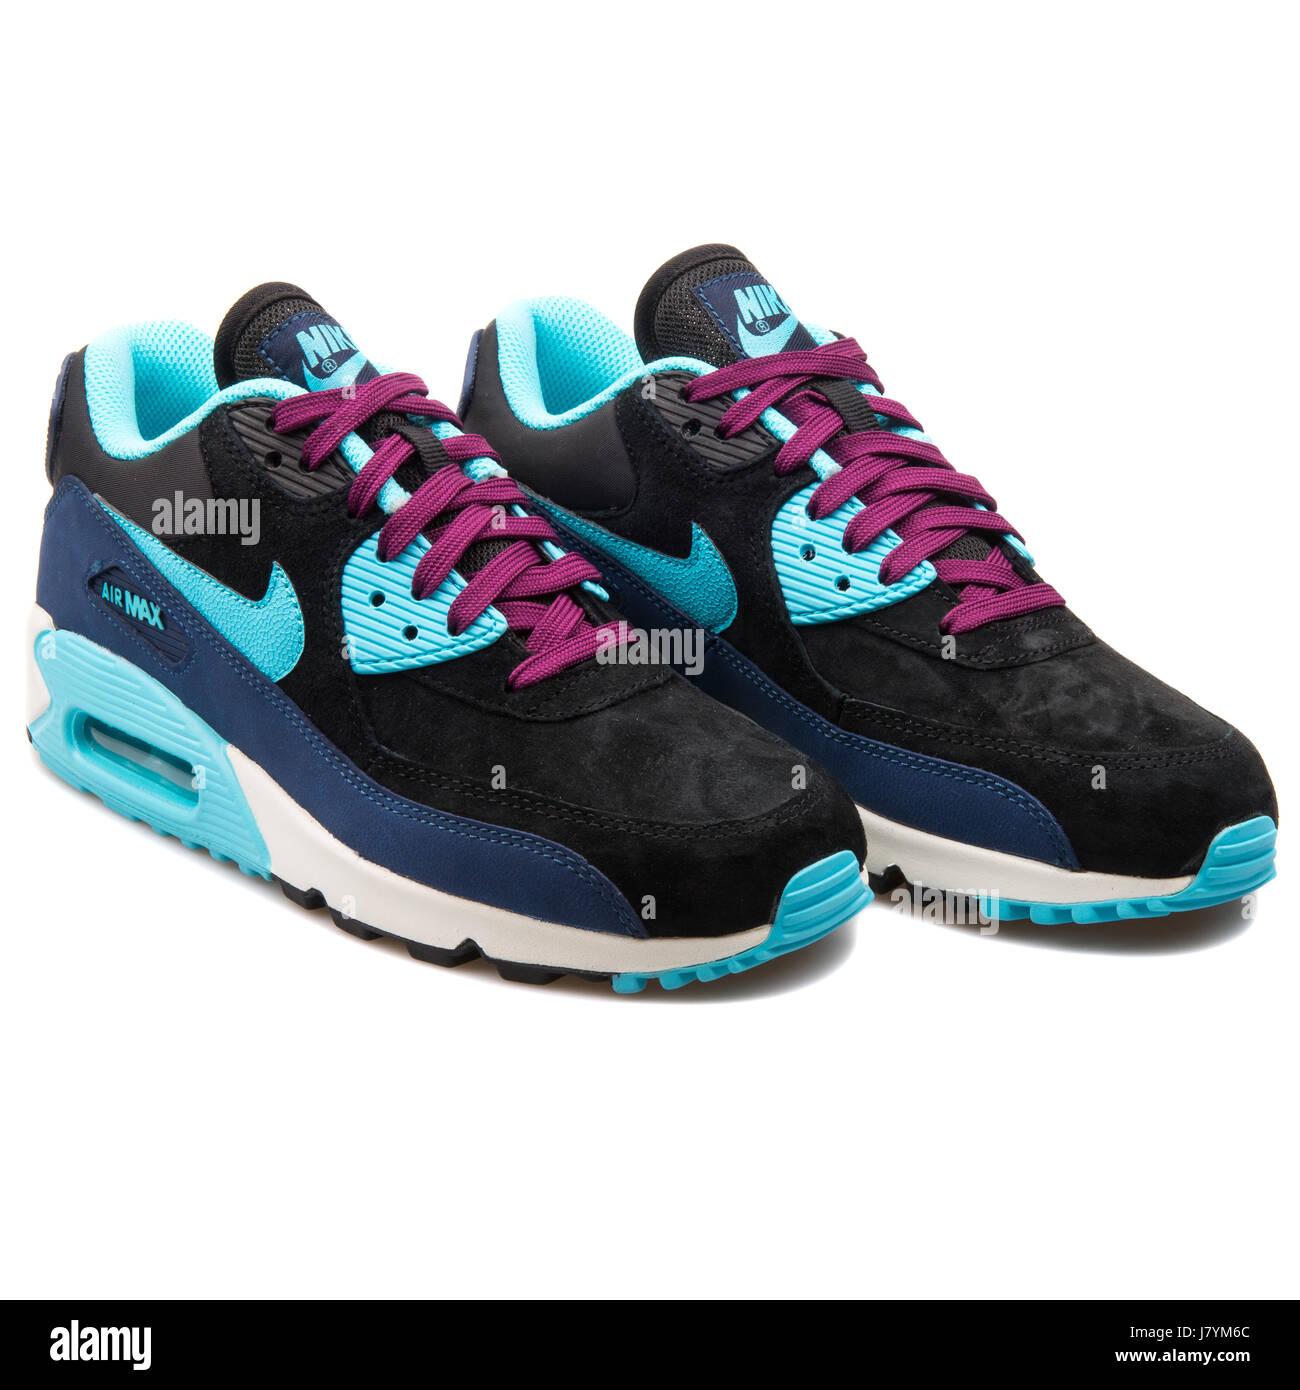 Nike WMNS Air Max 90 LTHR Black Blue Women s Running Sneakers - 768887-400 7c03710b235